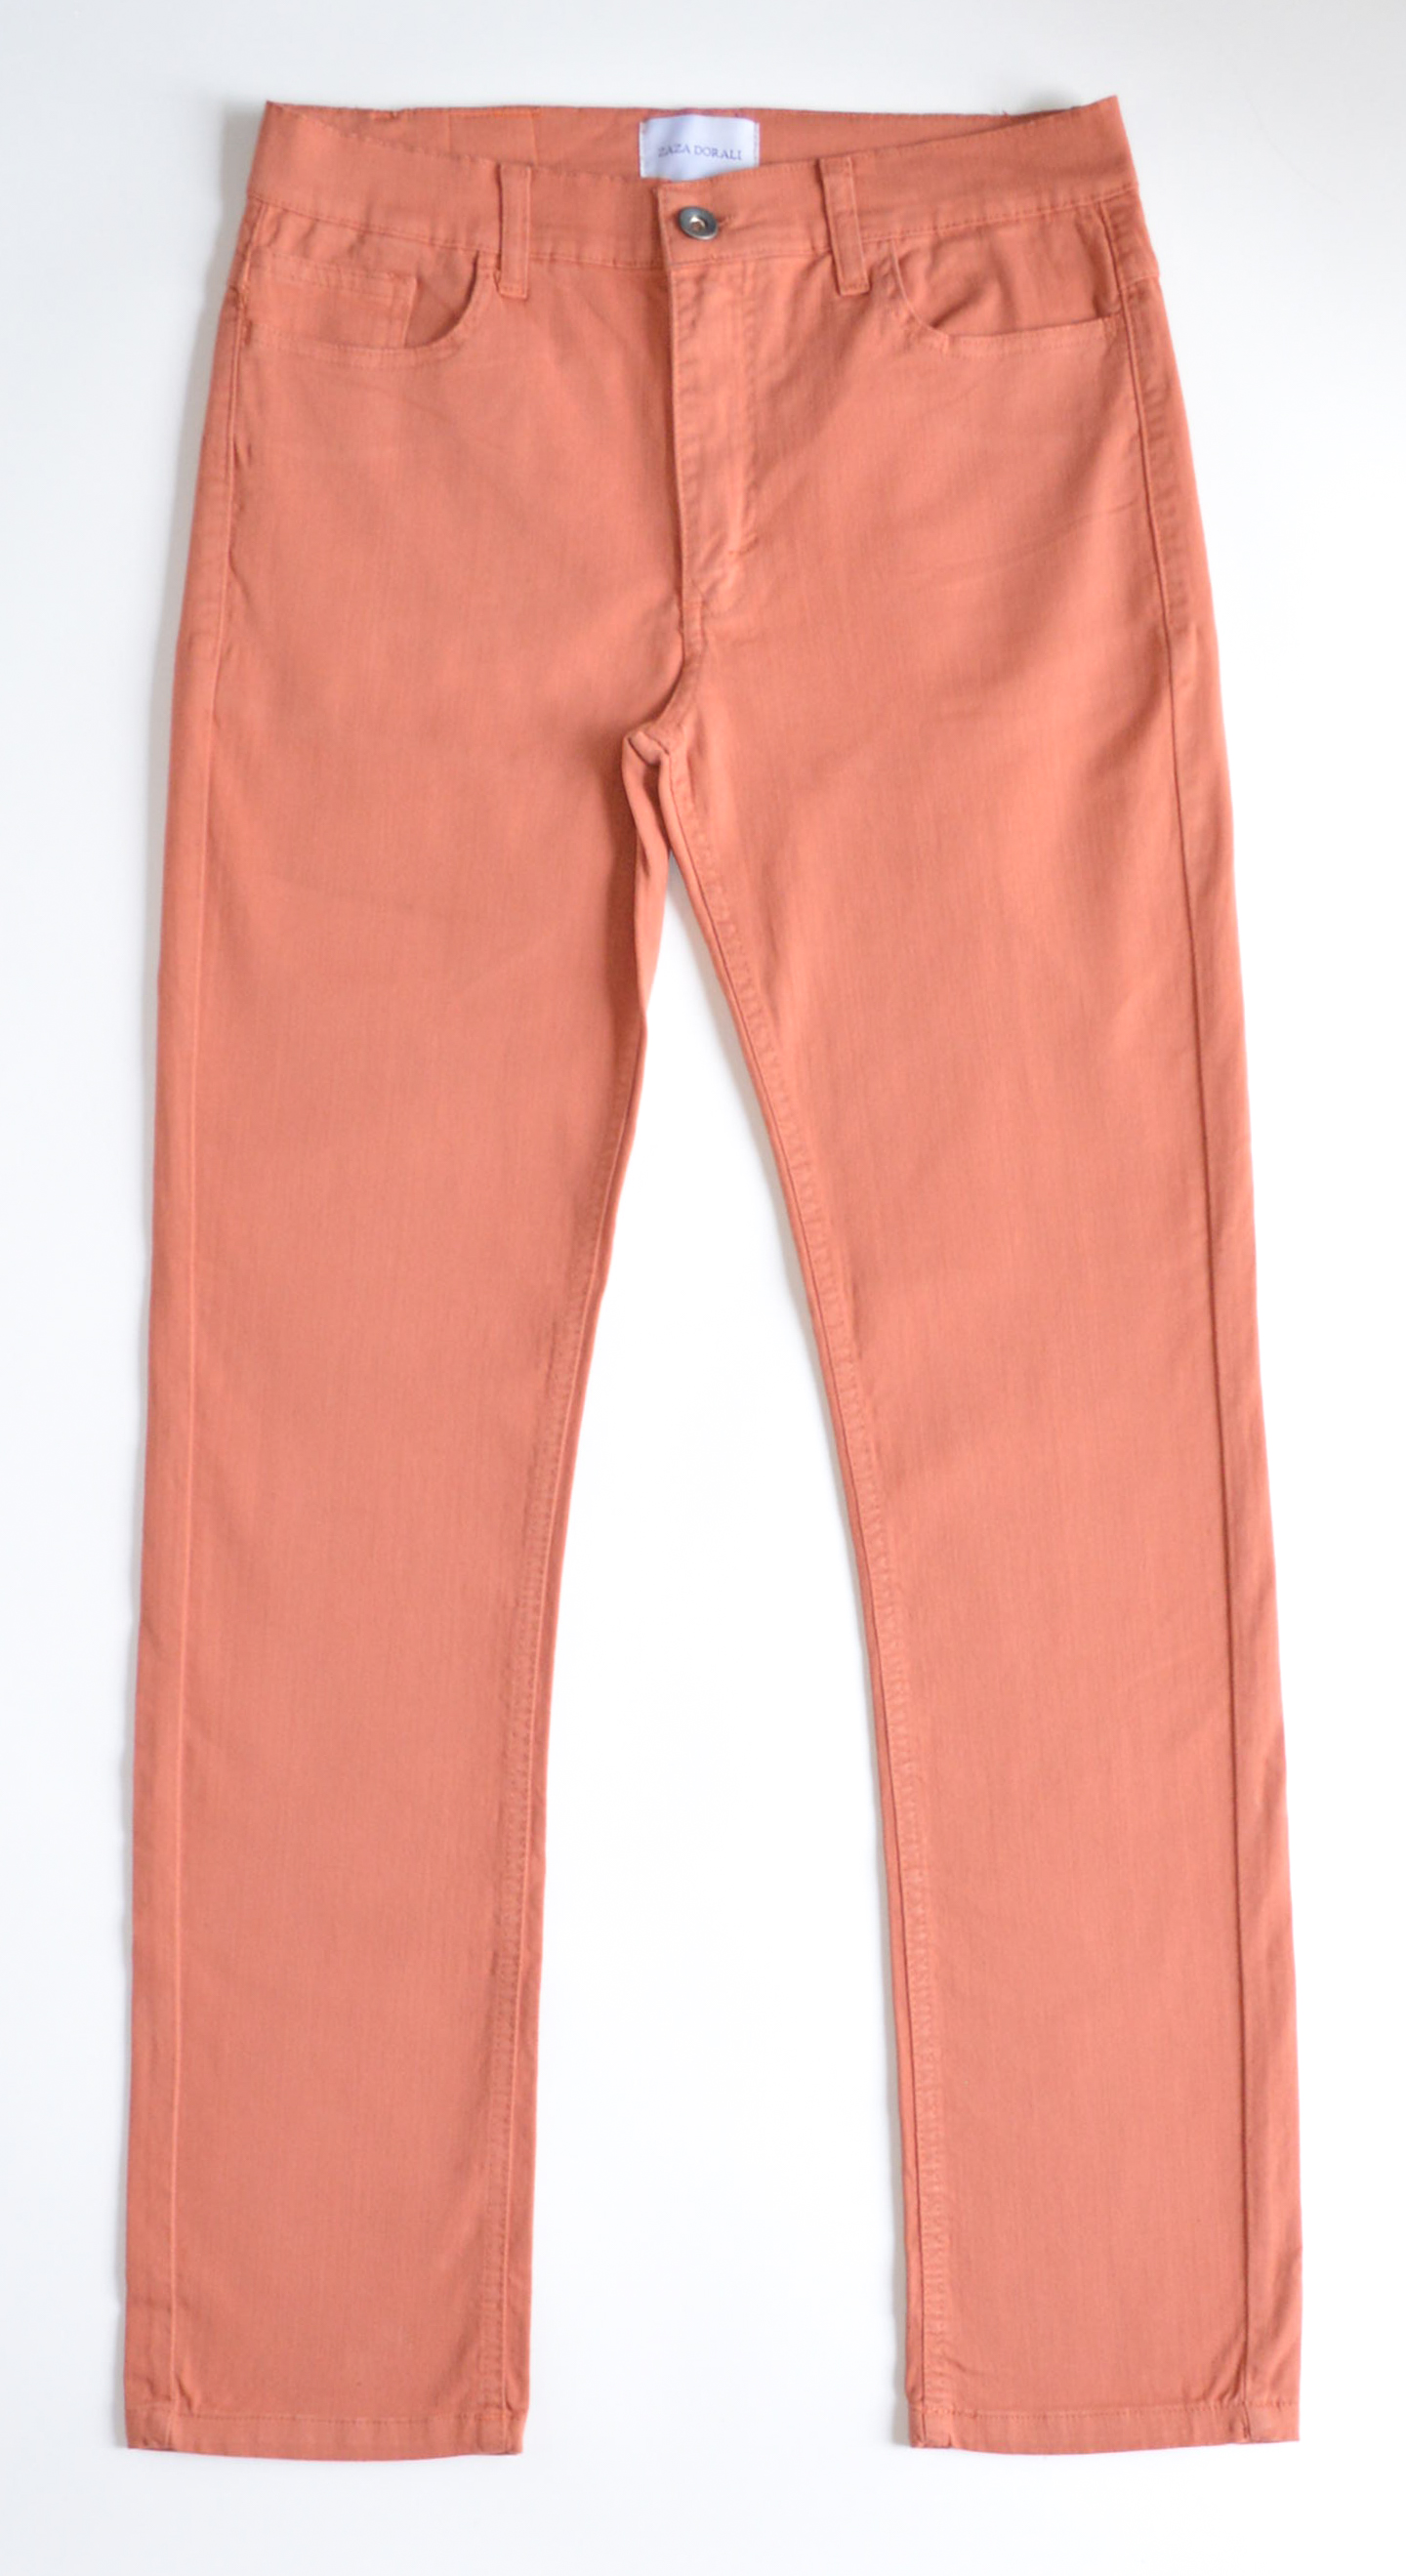 Jeans Canela